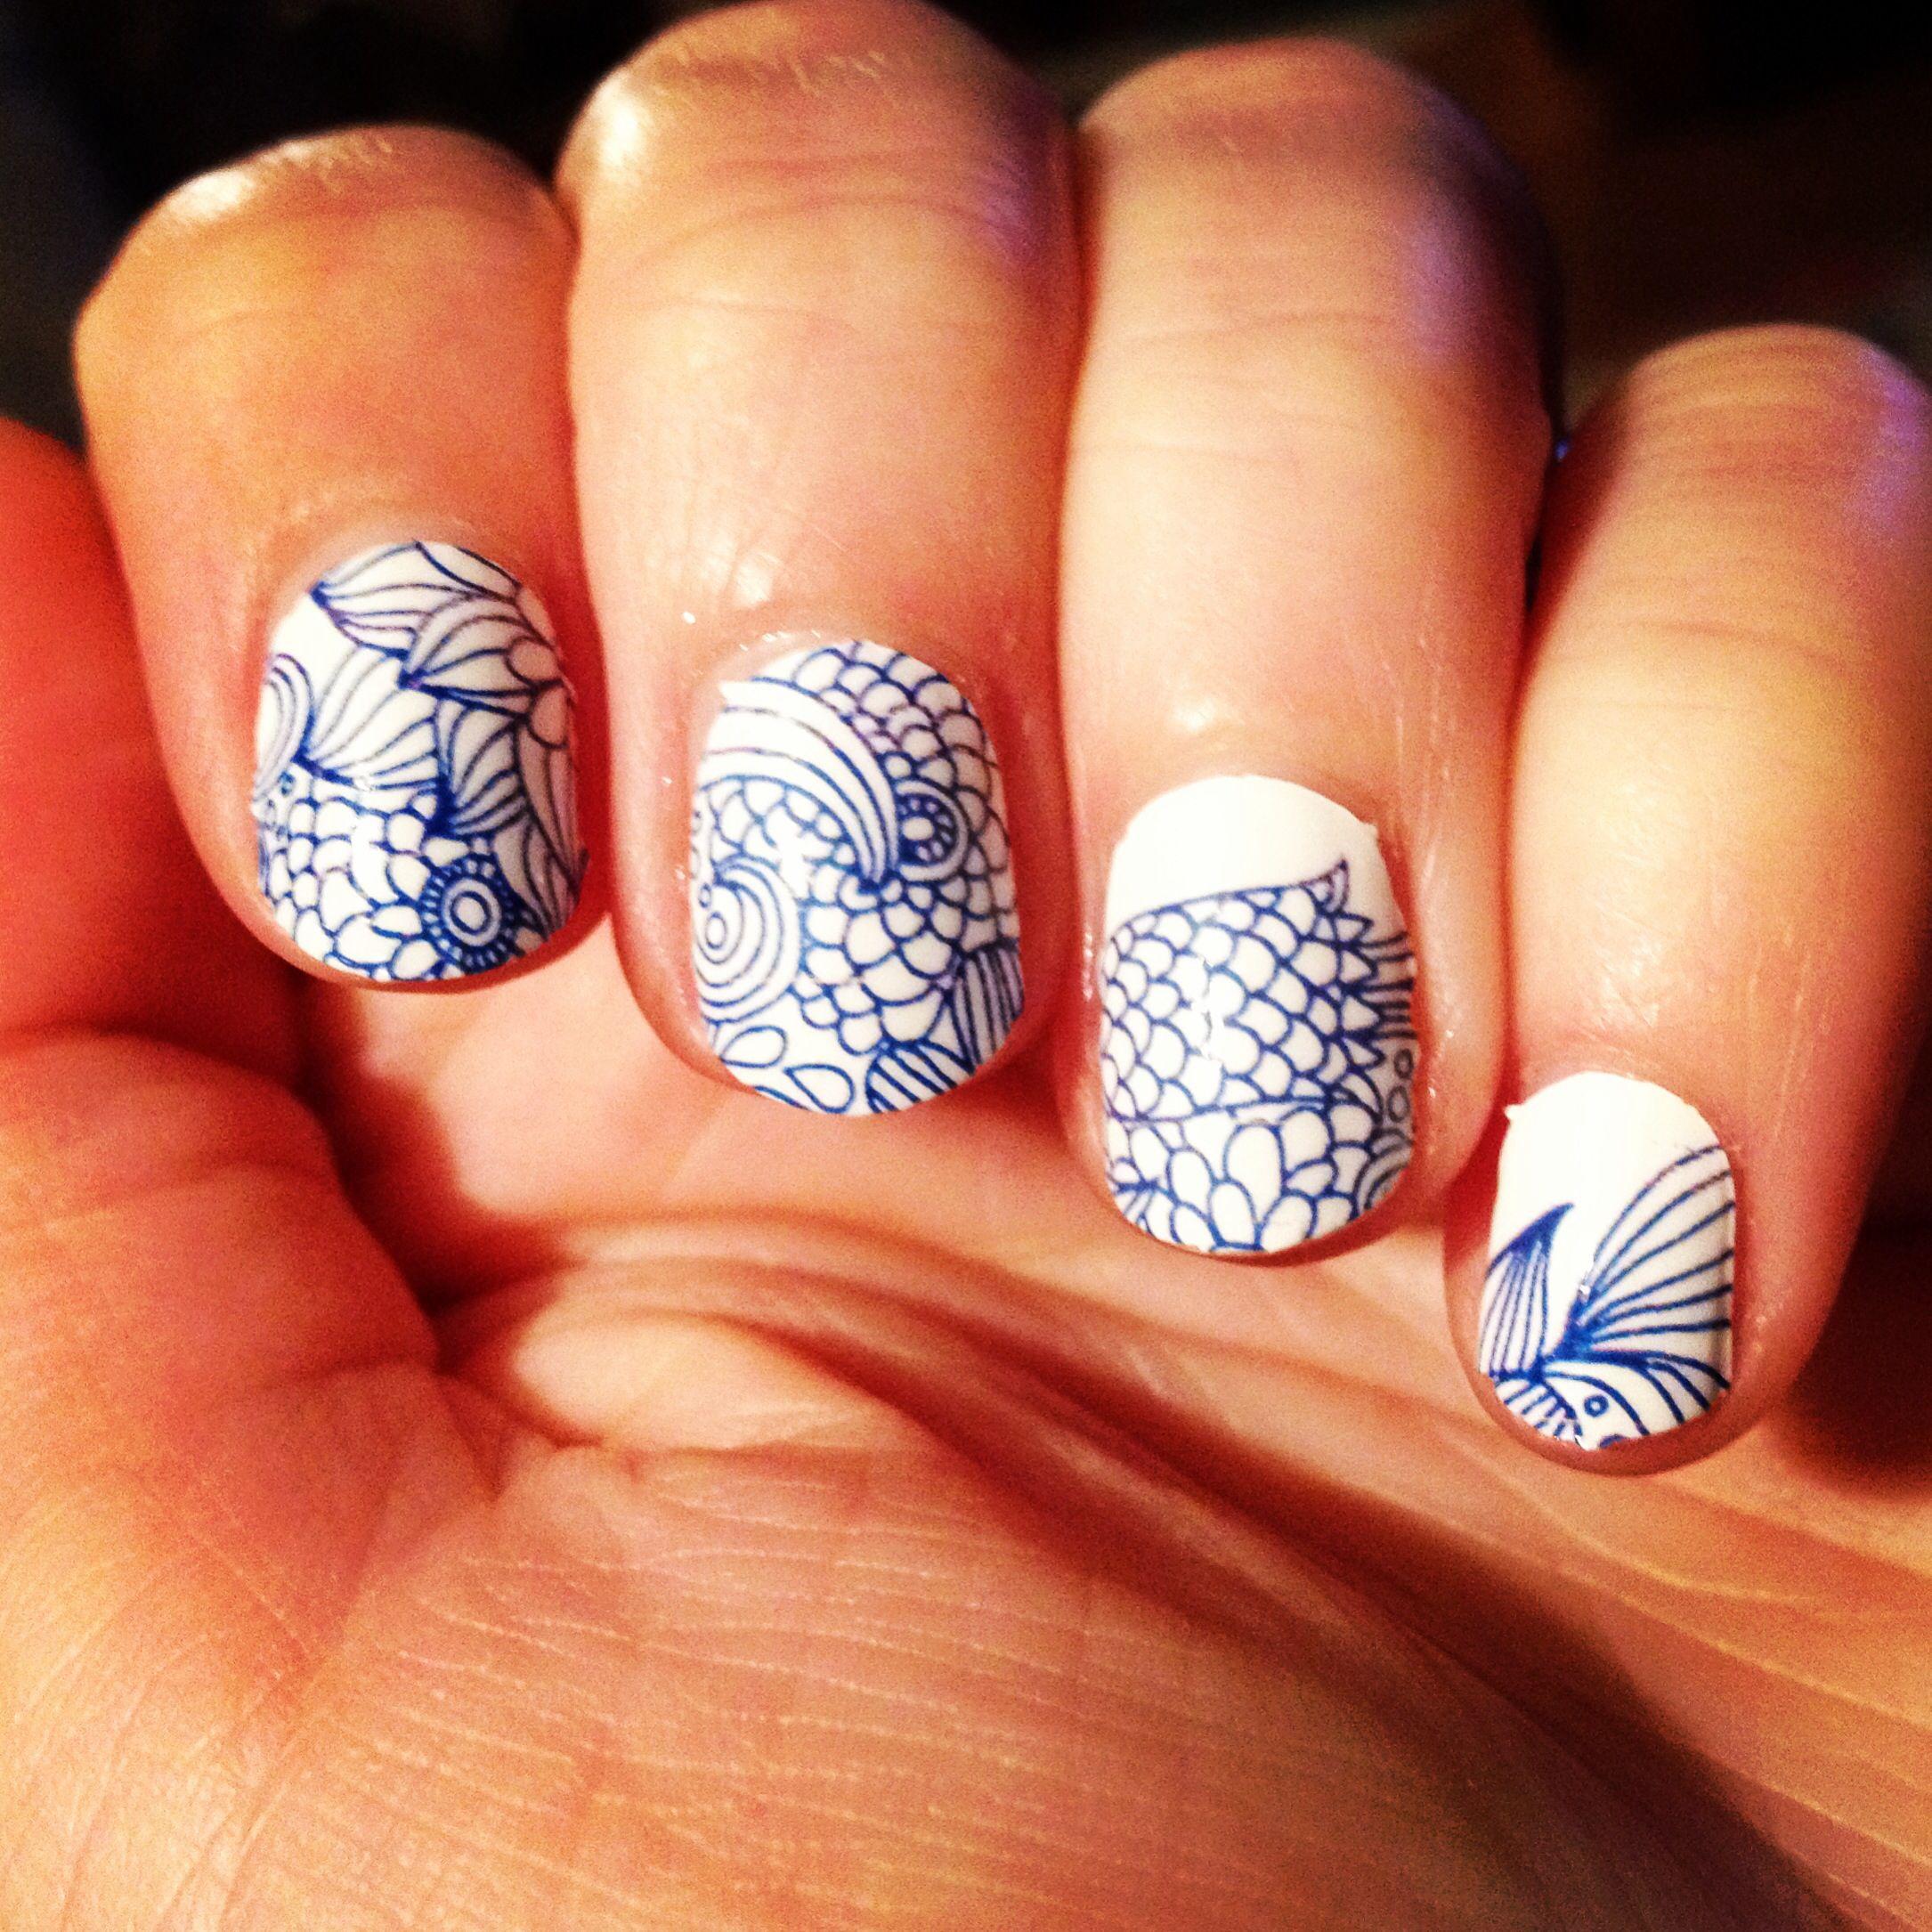 Sally Hansen Salon Effects in Empress-Ive   My Nails   Pinterest ...